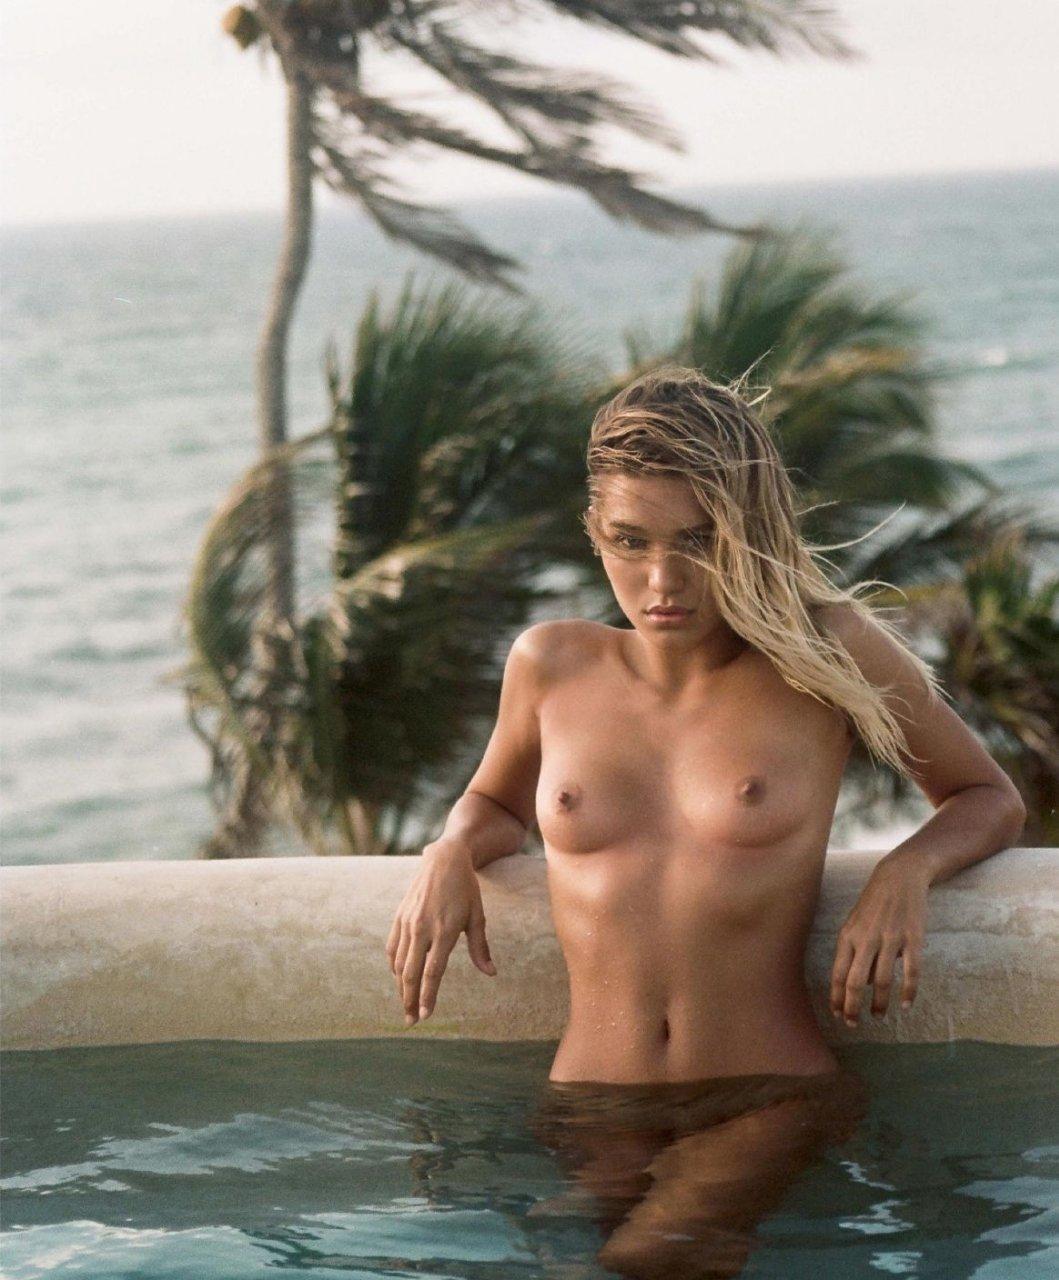 Porno Ana Ayora nude photos 2019